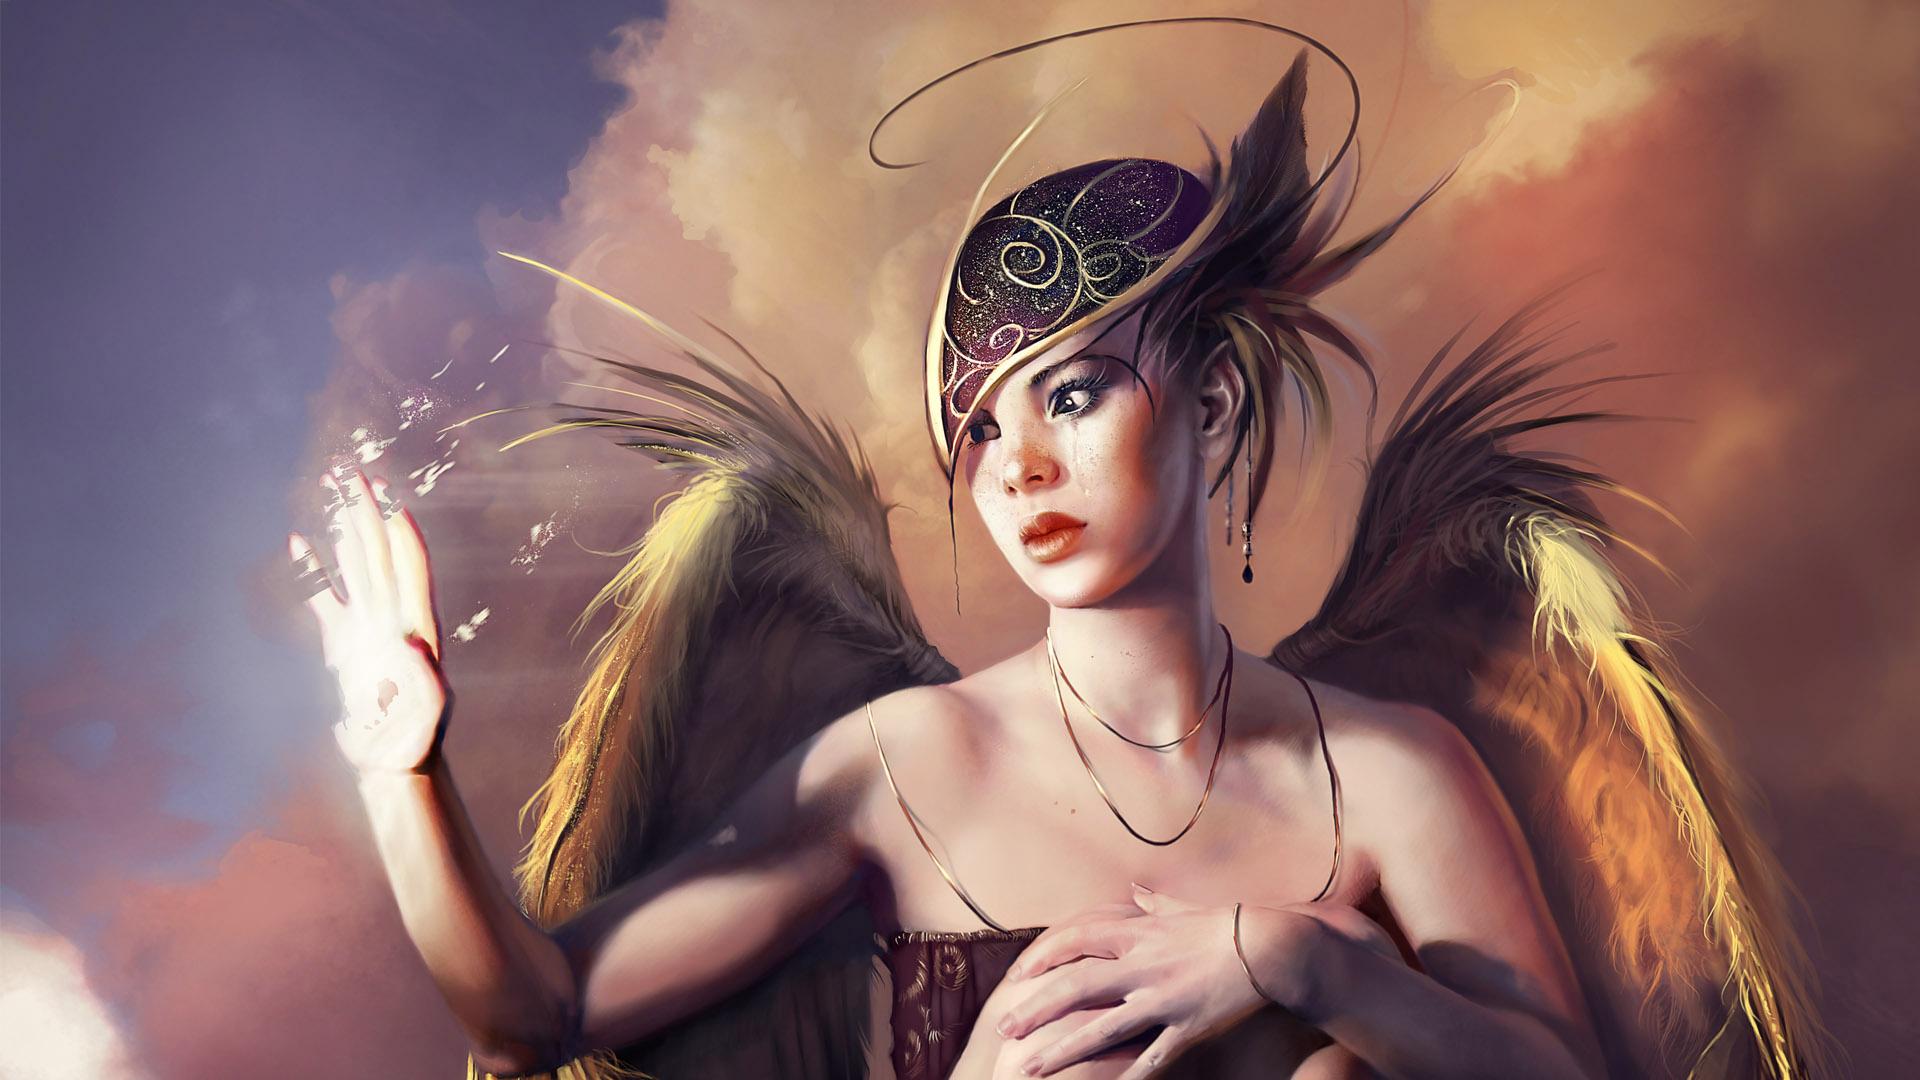 3d Fantasy Girls Wallpaper 1920x1080 56833